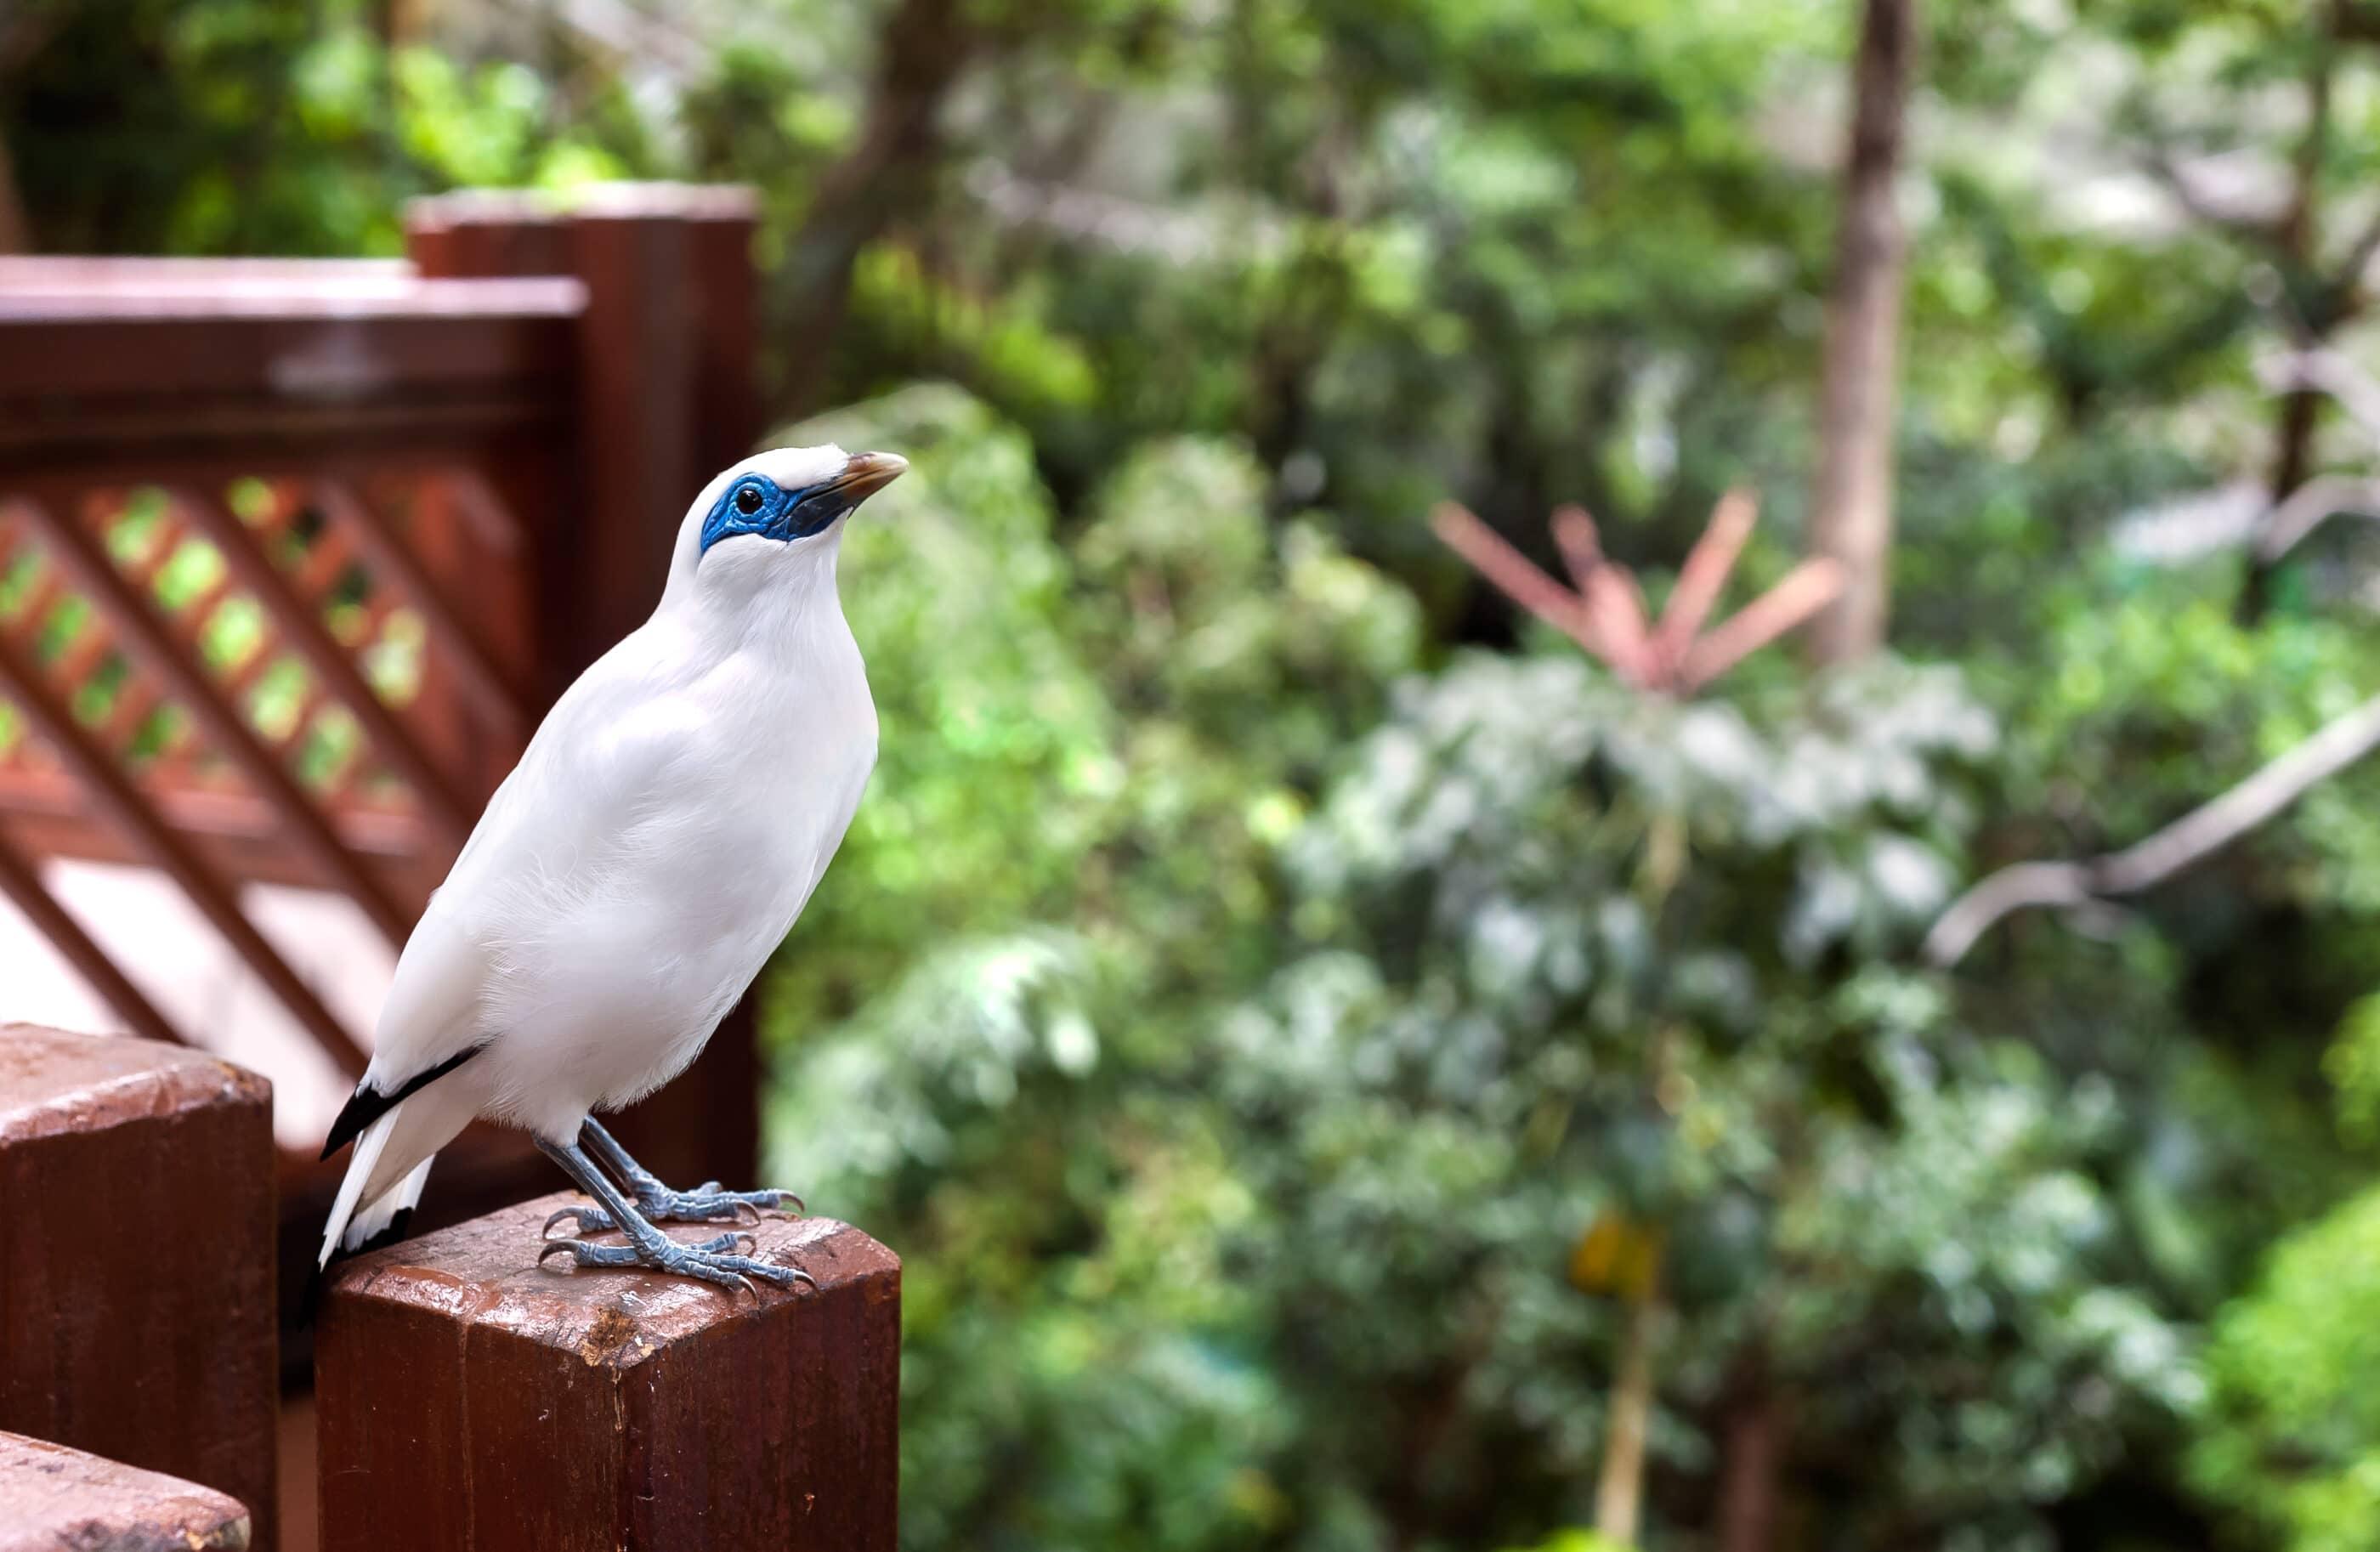 Bali Mynah bird stands on a wooden post at the Edward Youde Aviary, Hong Kong Park